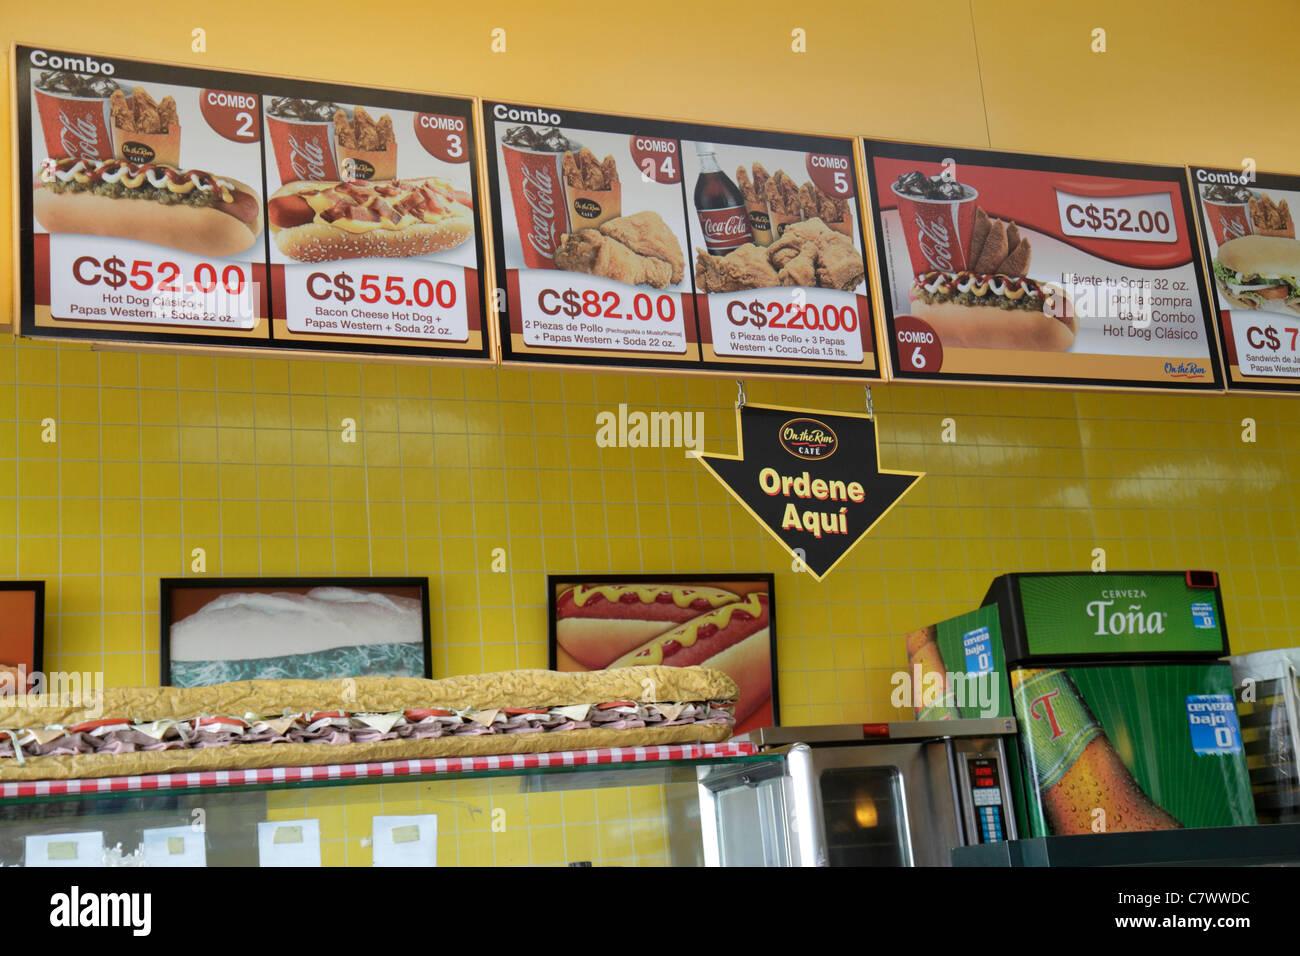 Cordoba Food Store